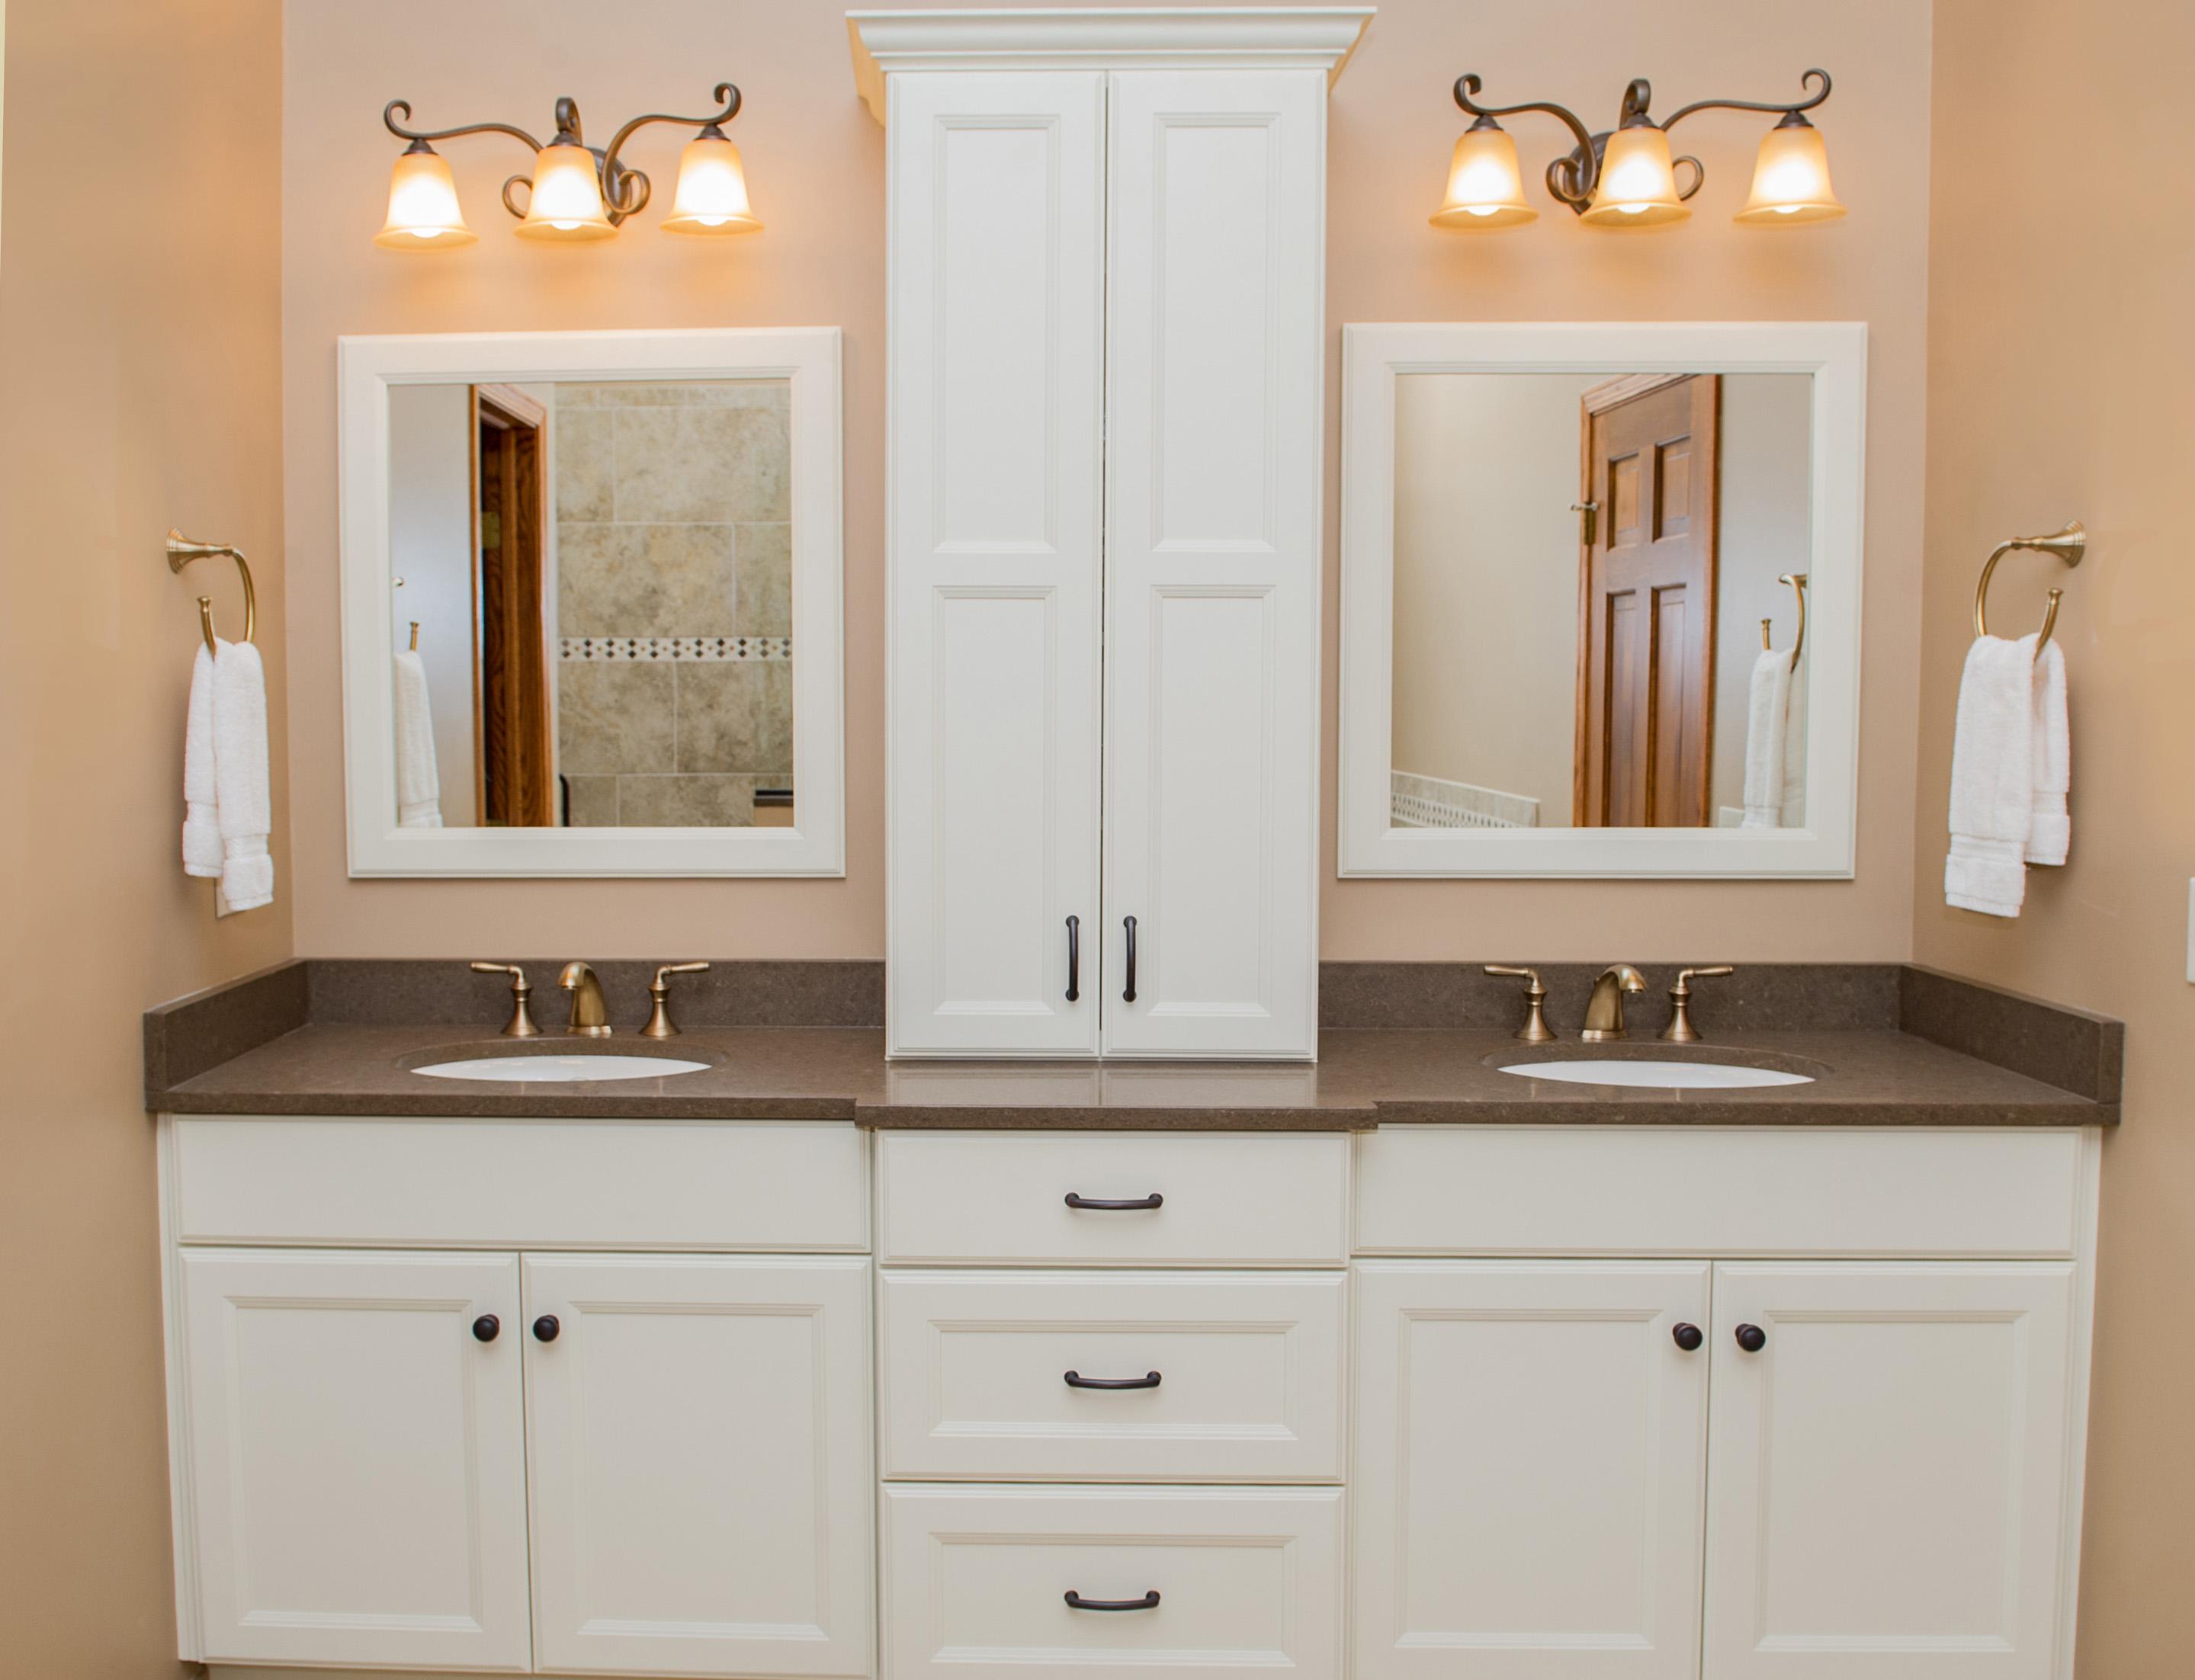 Custom Bathroom Vanities With Towers double vanity with tower. double vanity with towerbeautiful double